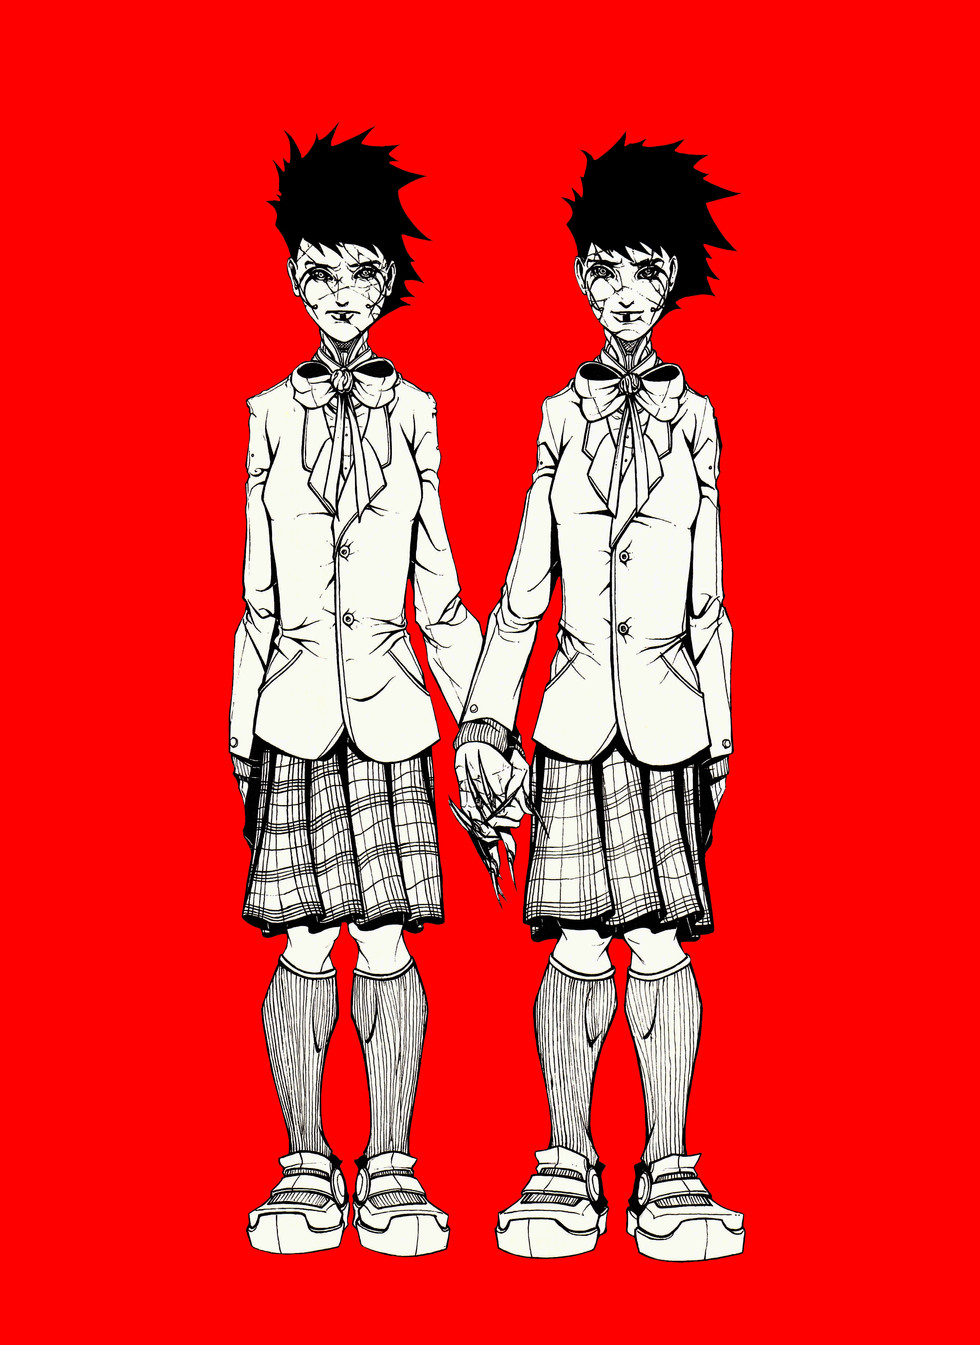 THE SCHOOL GIRLS PROMO DESIGN